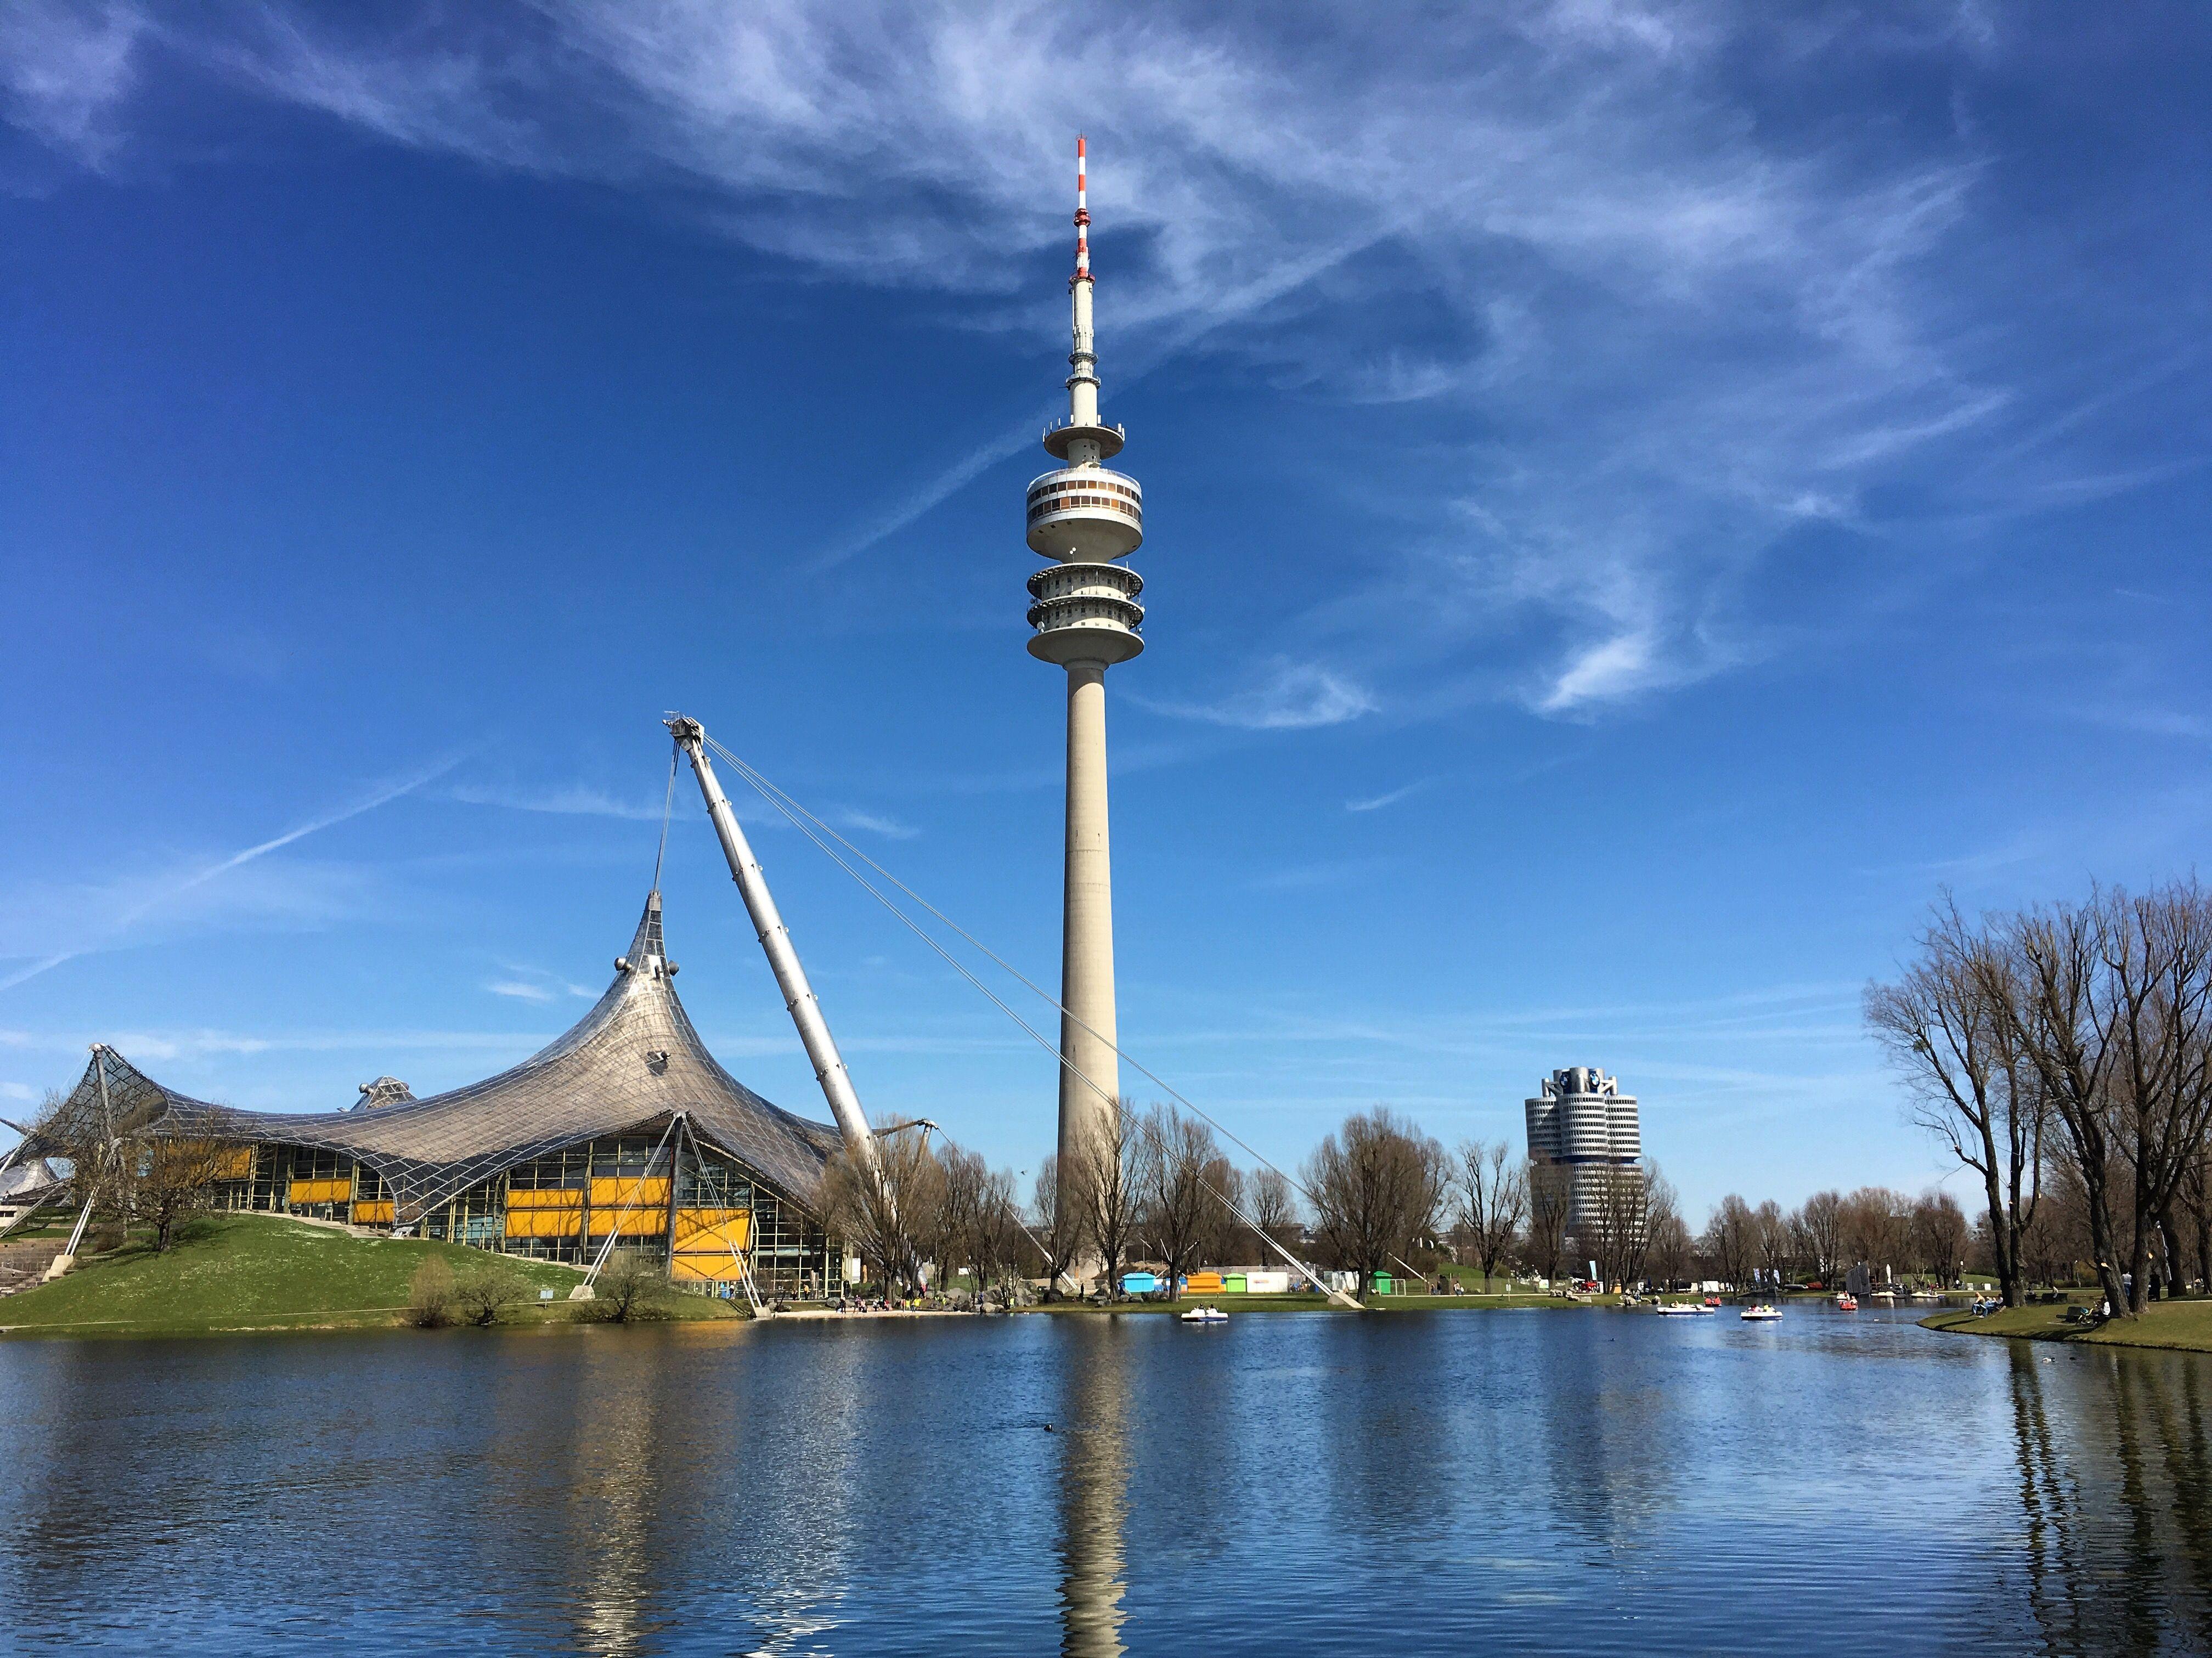 Olympiapark Olympiaturm Munich Munchen Minga Bayern Bavaria Deutschland Germany Munich Germany Germany Munich